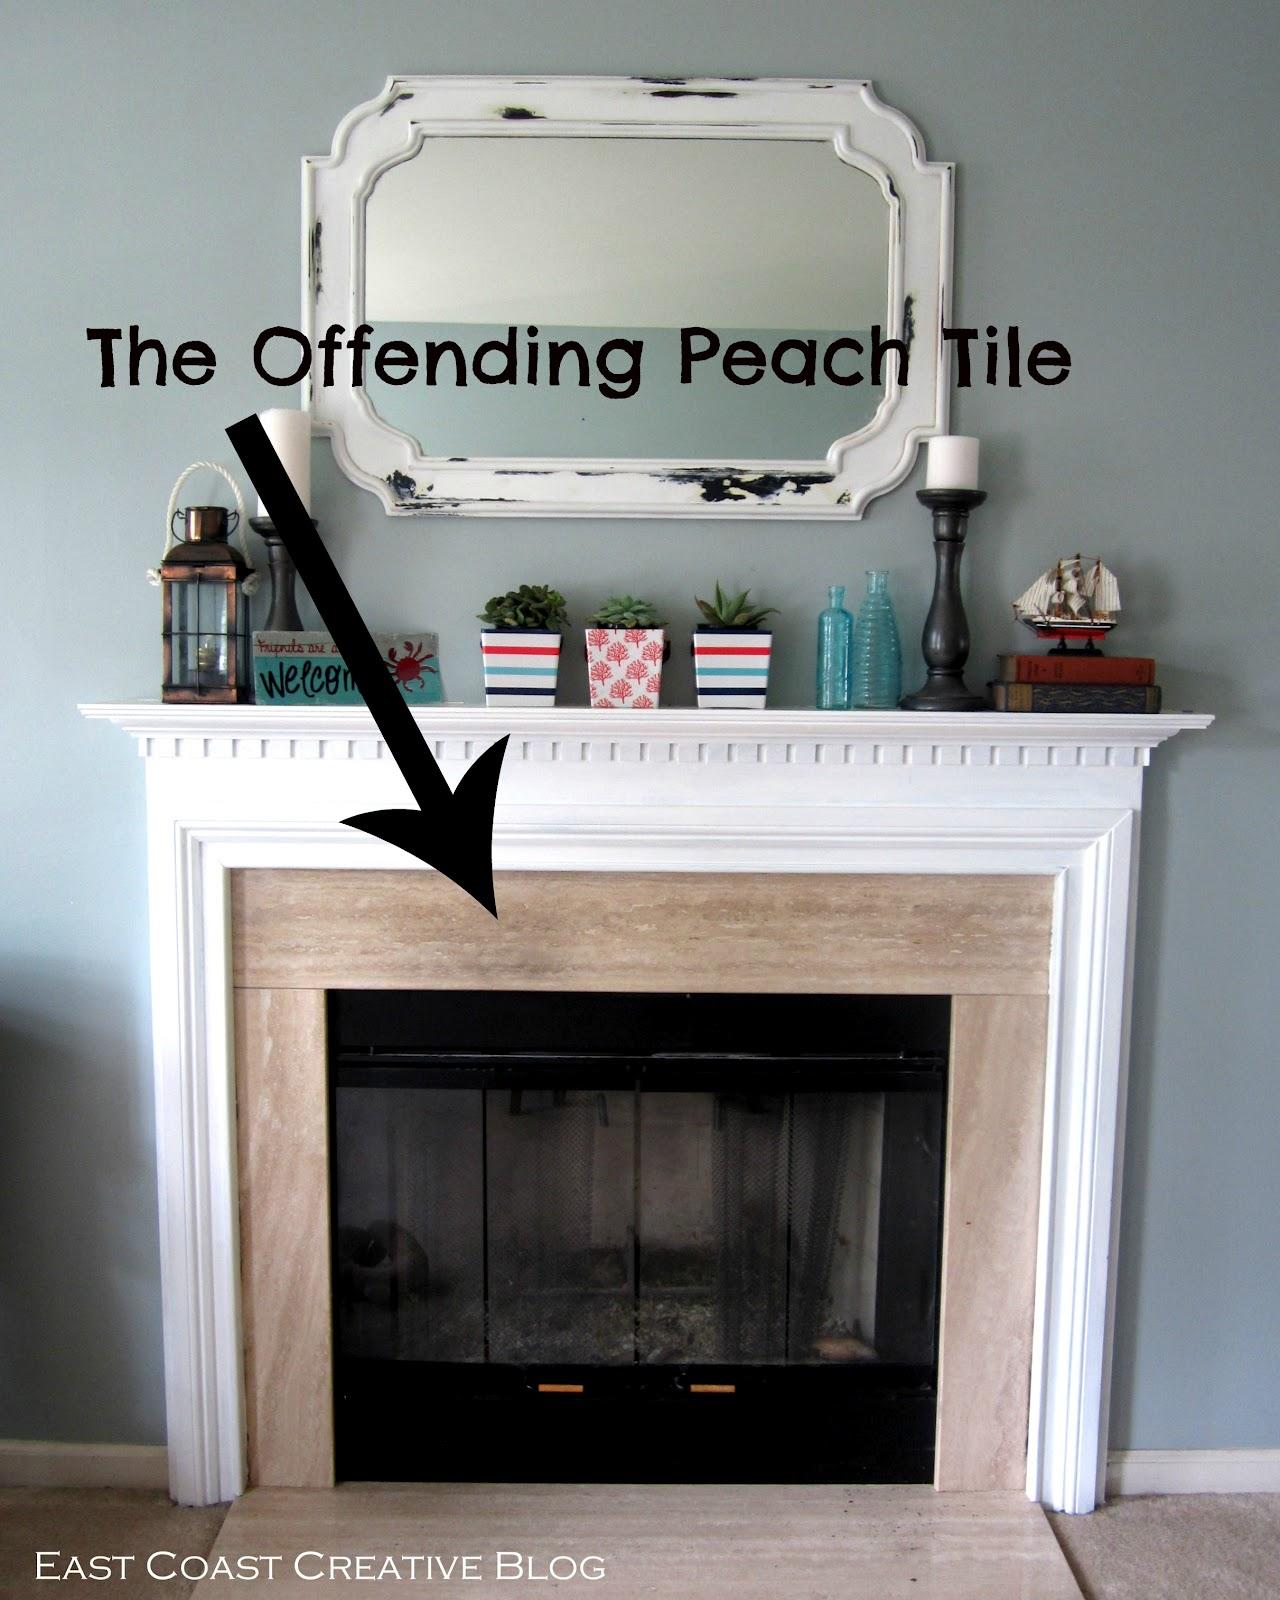 offending peach tile